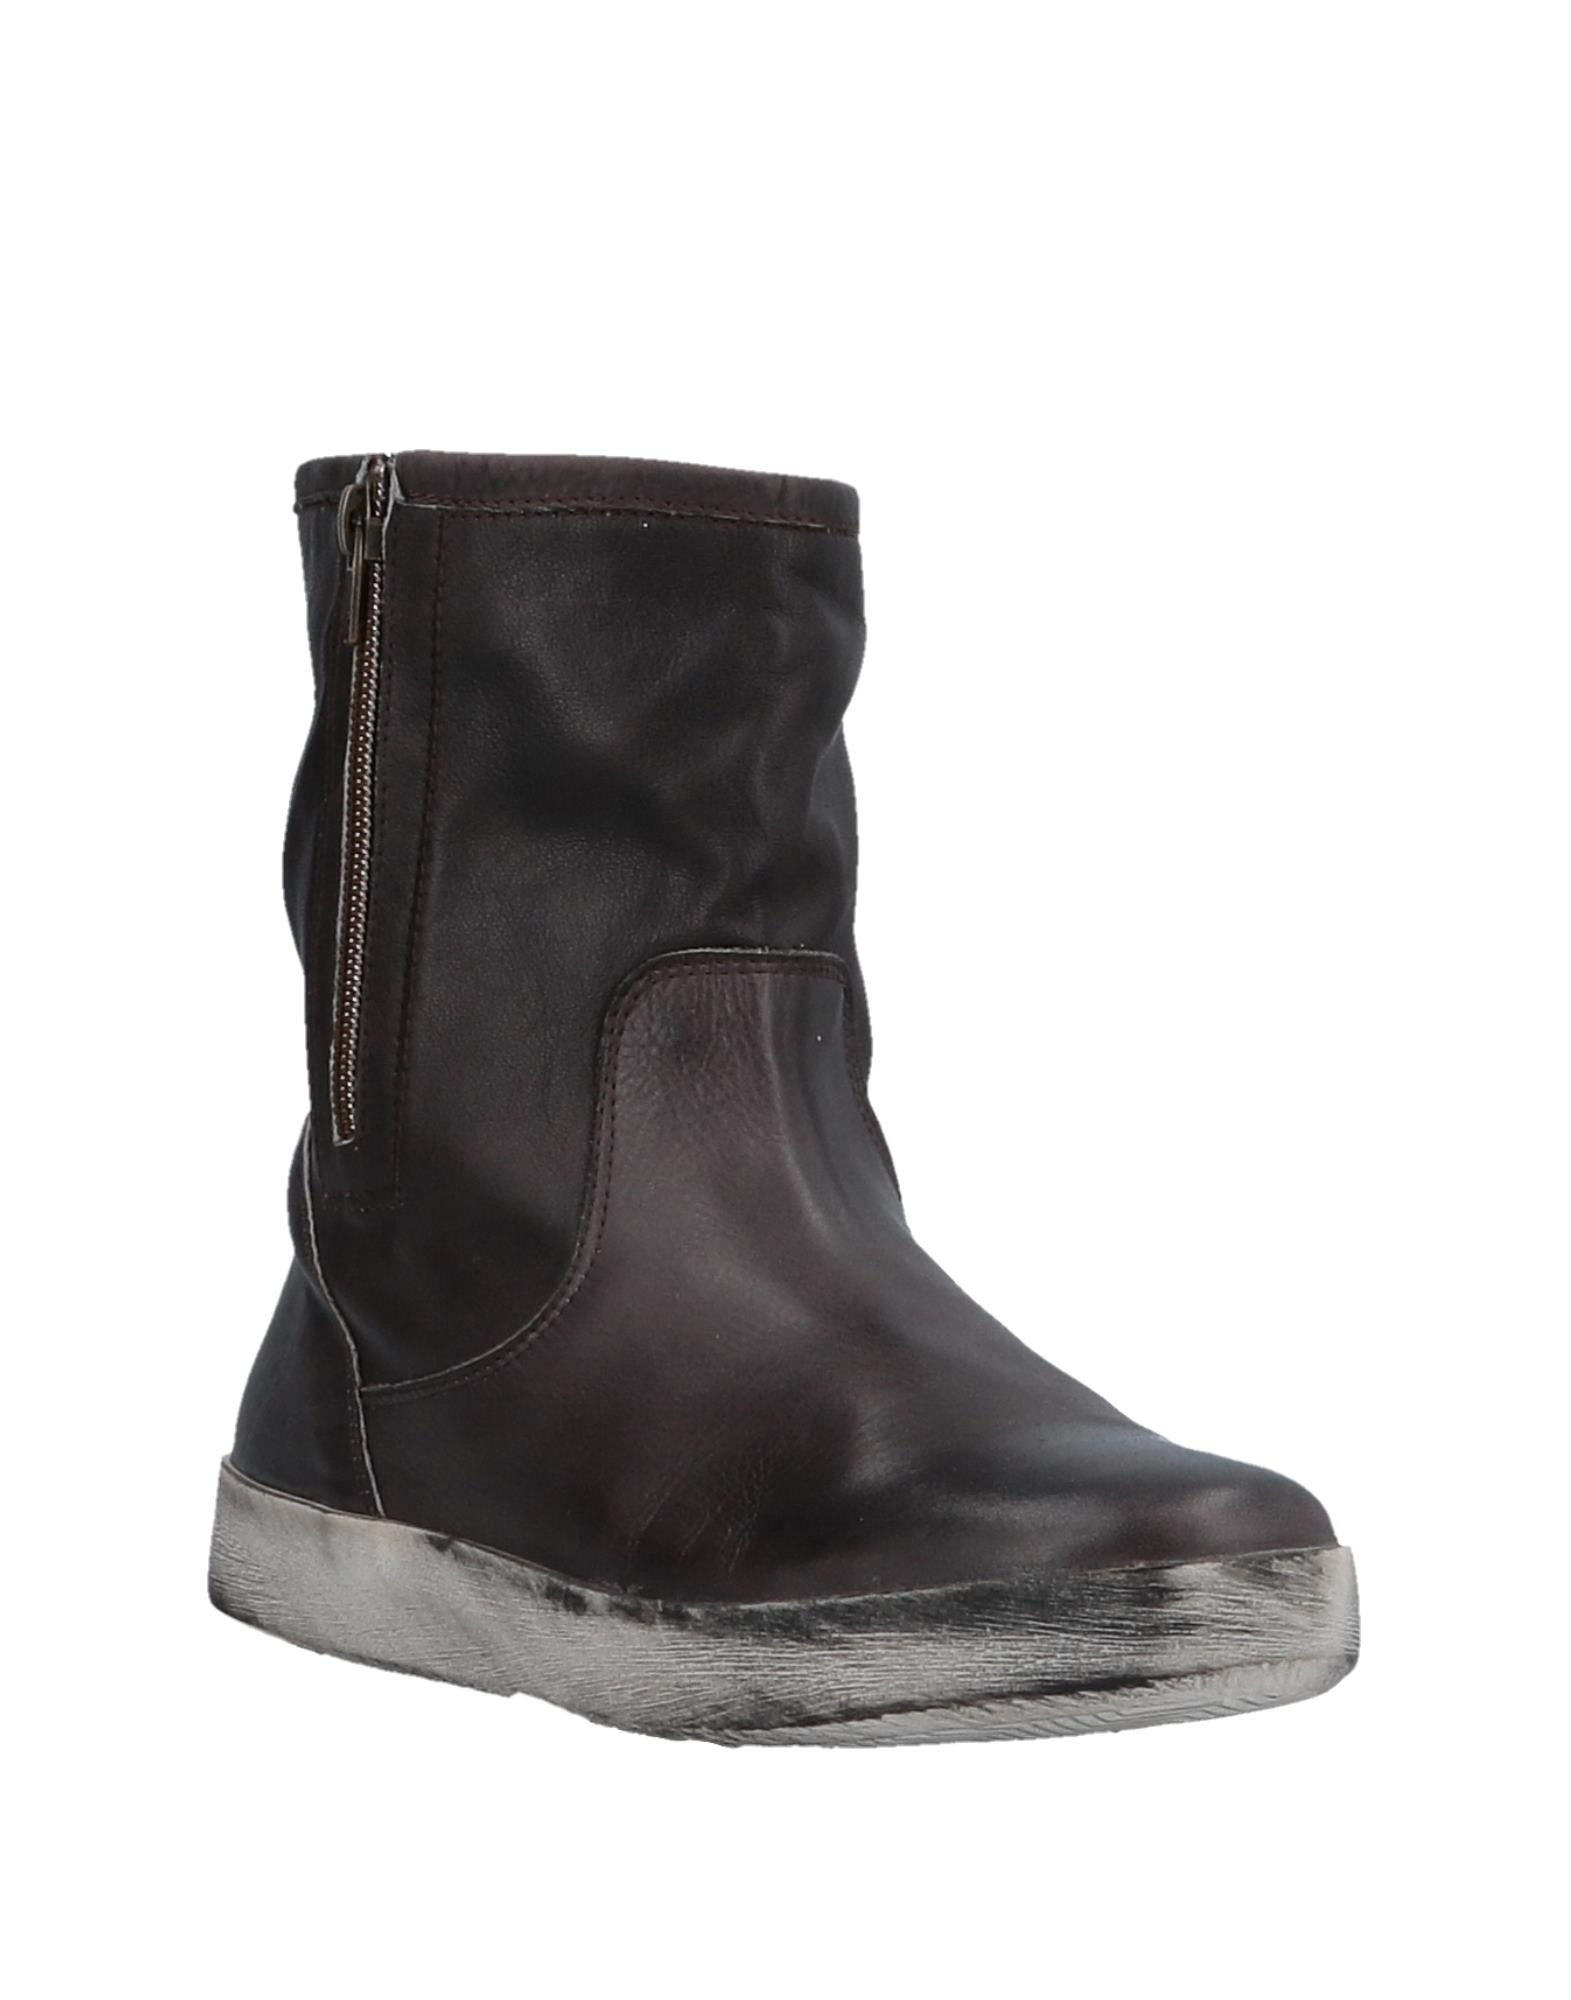 Haltbare Mode Mode Mode billige Schuhe Lea 11509764OC Beliebte Schuhe 681a0f